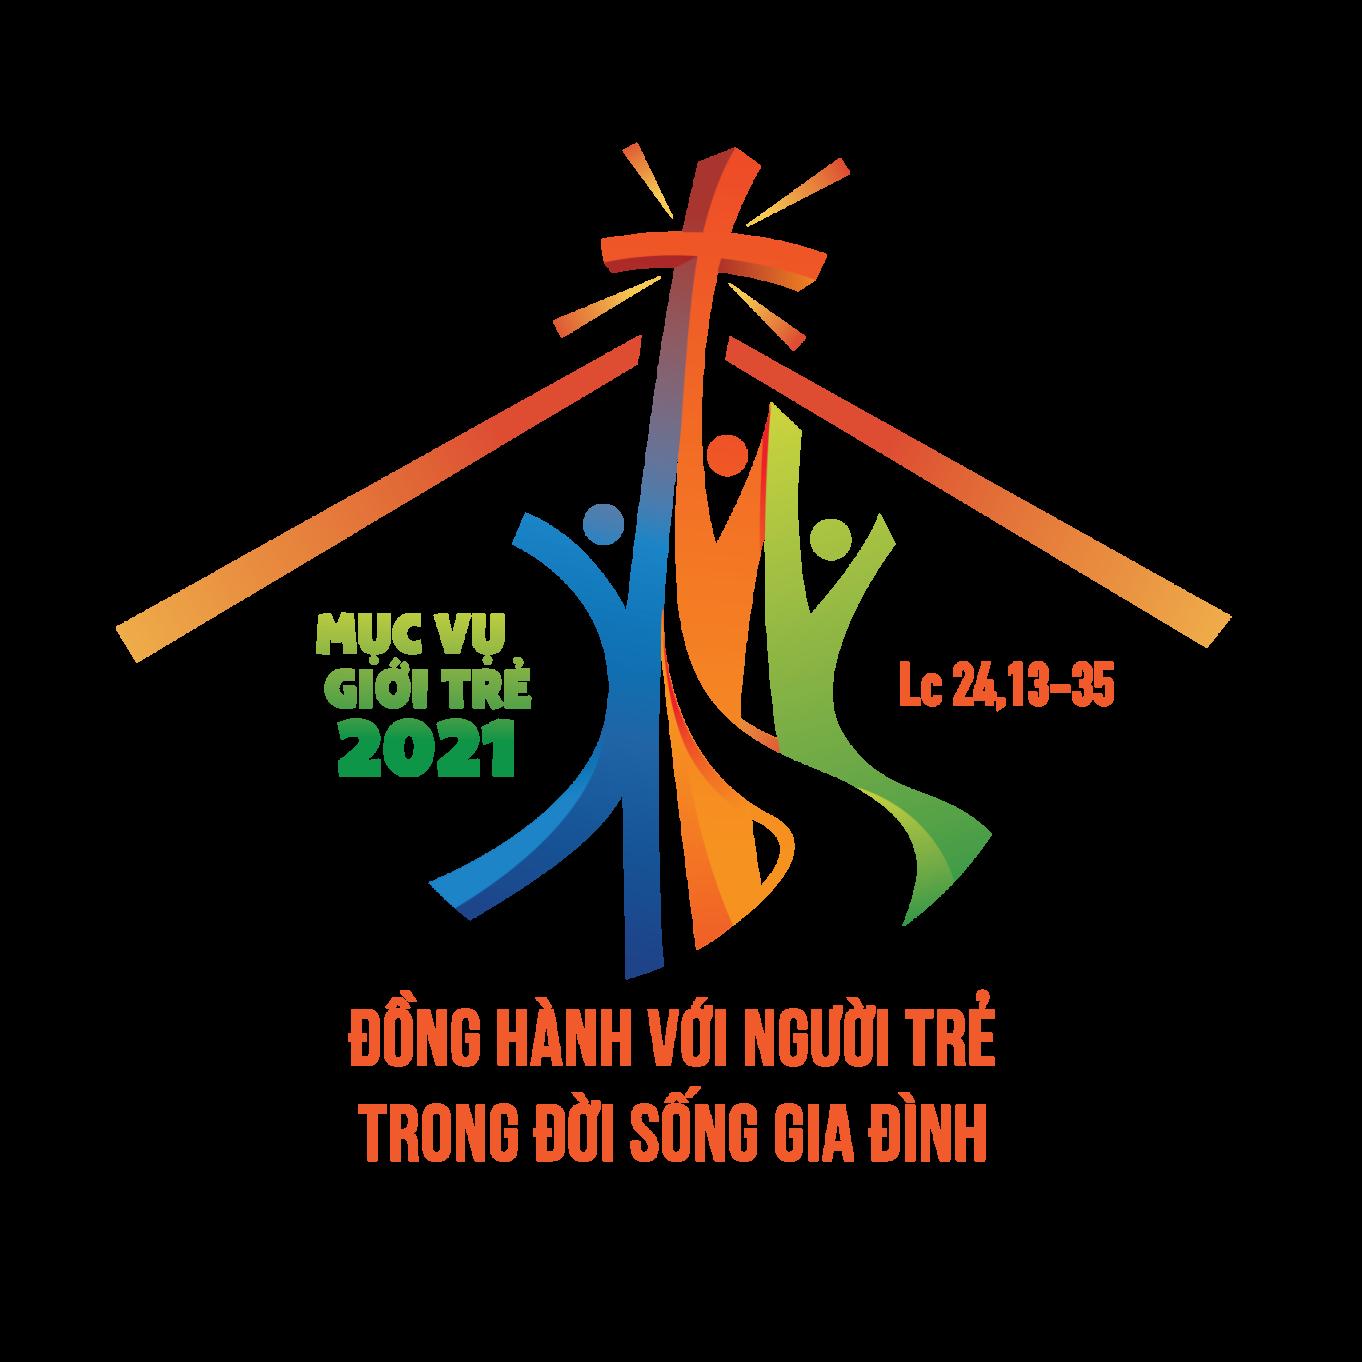 https://hdgmvietnam.com/admin/upload/image/cong-bo-logo-nam-muc-vu-gioi-tre-2021.png